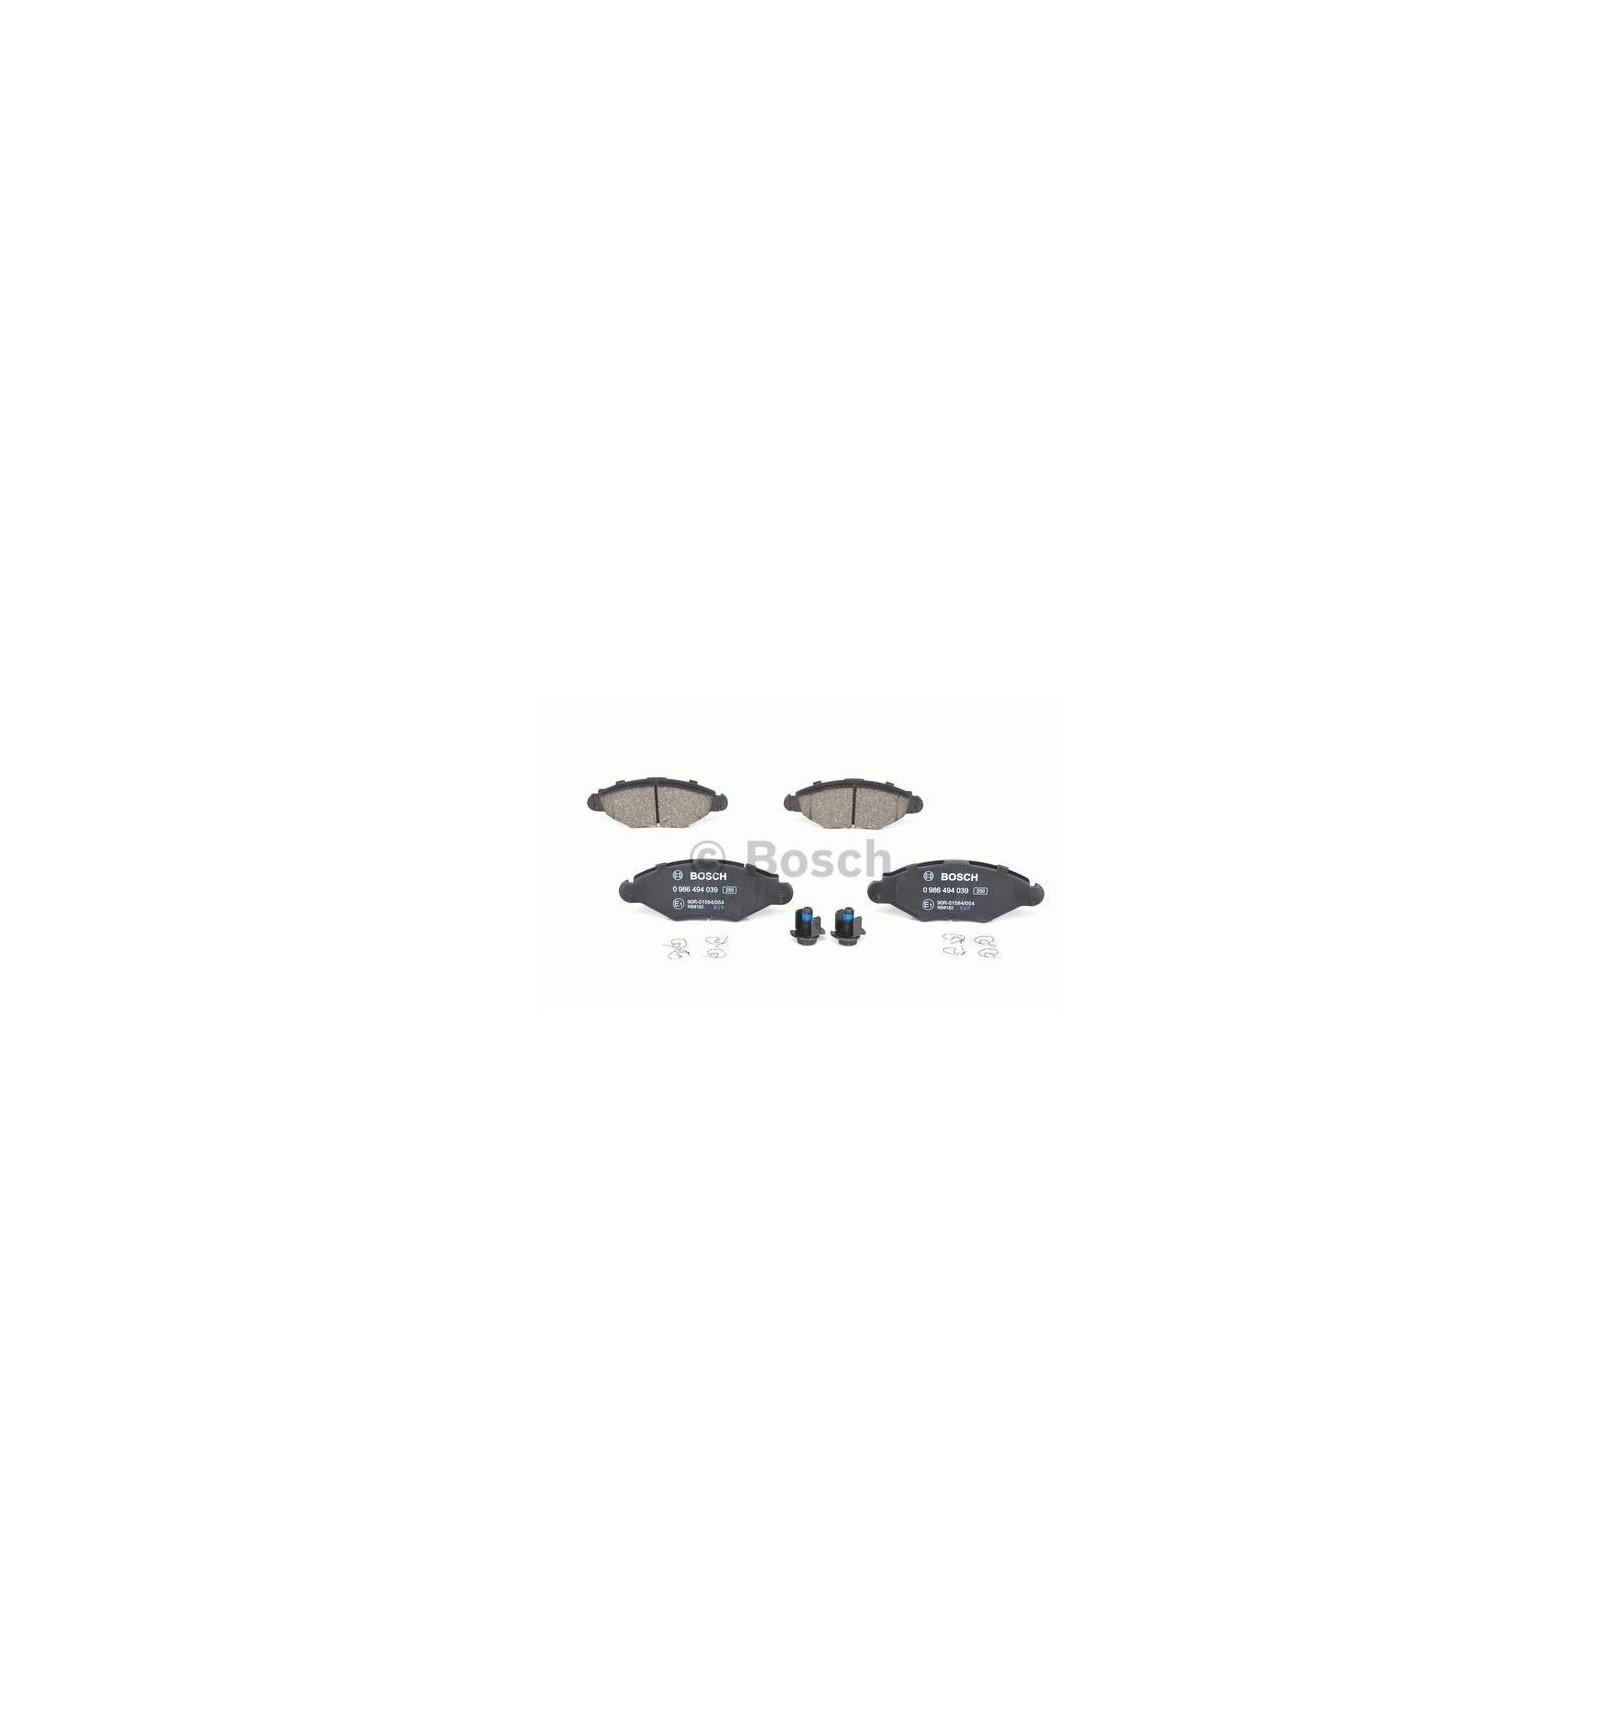 jeu de 4 plaquettes de frein avant citroen peugeot. Black Bedroom Furniture Sets. Home Design Ideas